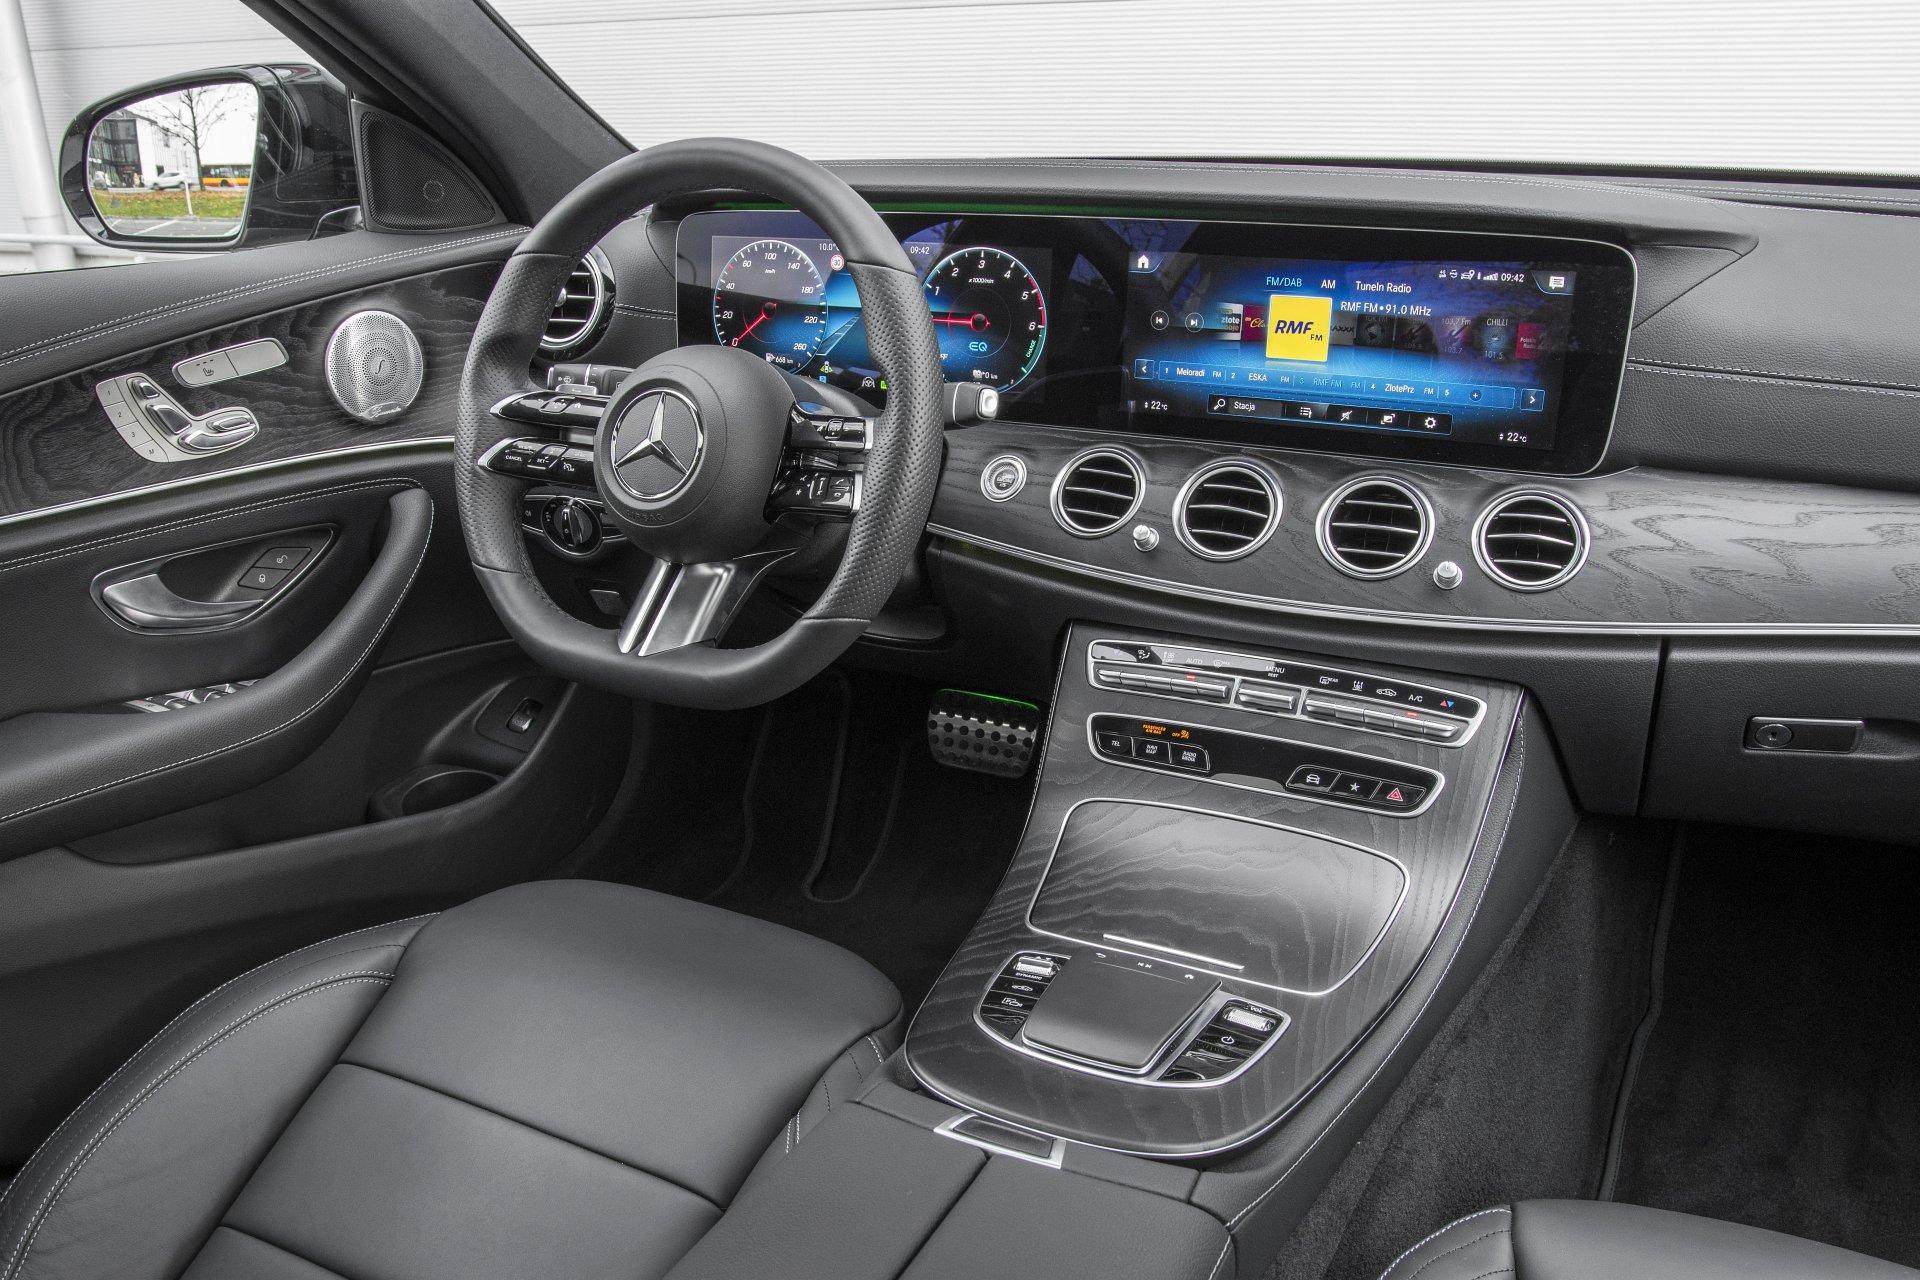 Mercedes E 300 de lifting (2020) - test - kokpit, deska rozdzielcza 01